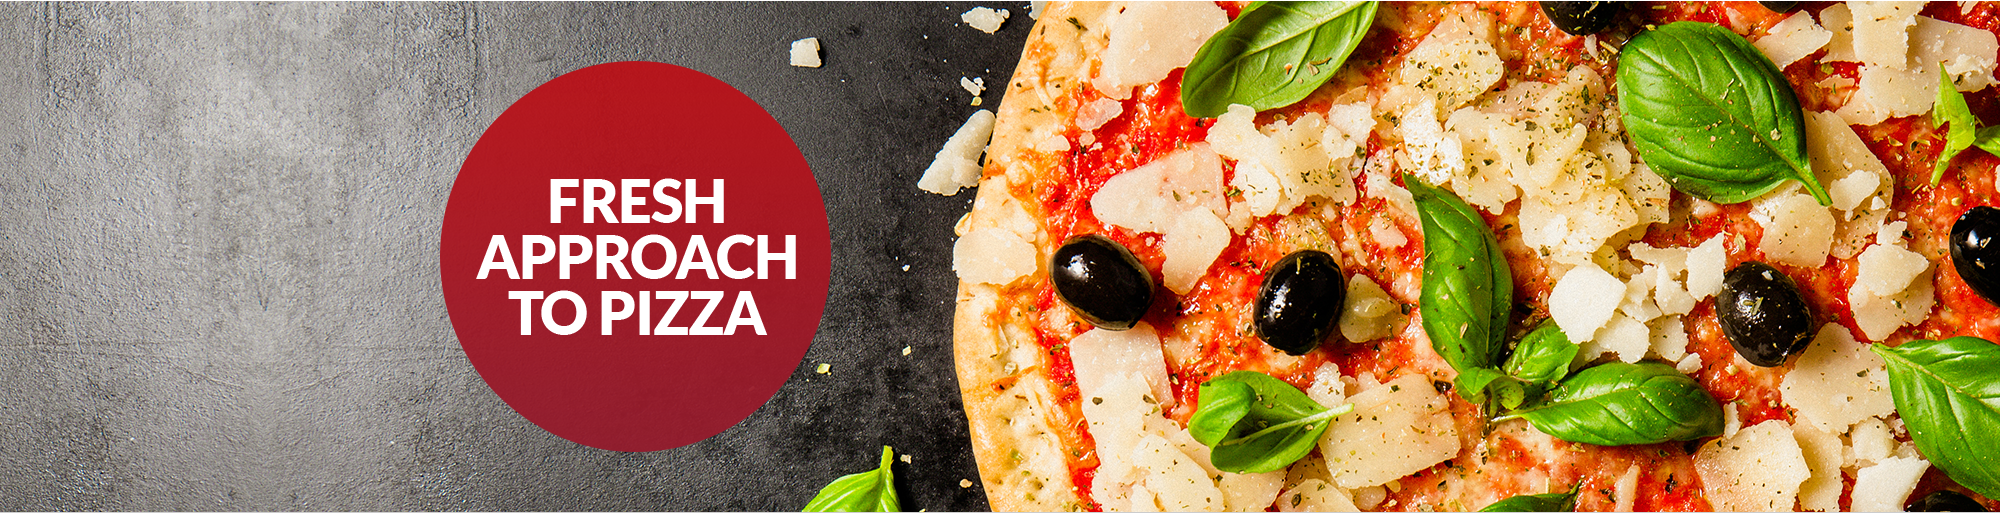 Milano Pizza Franchise